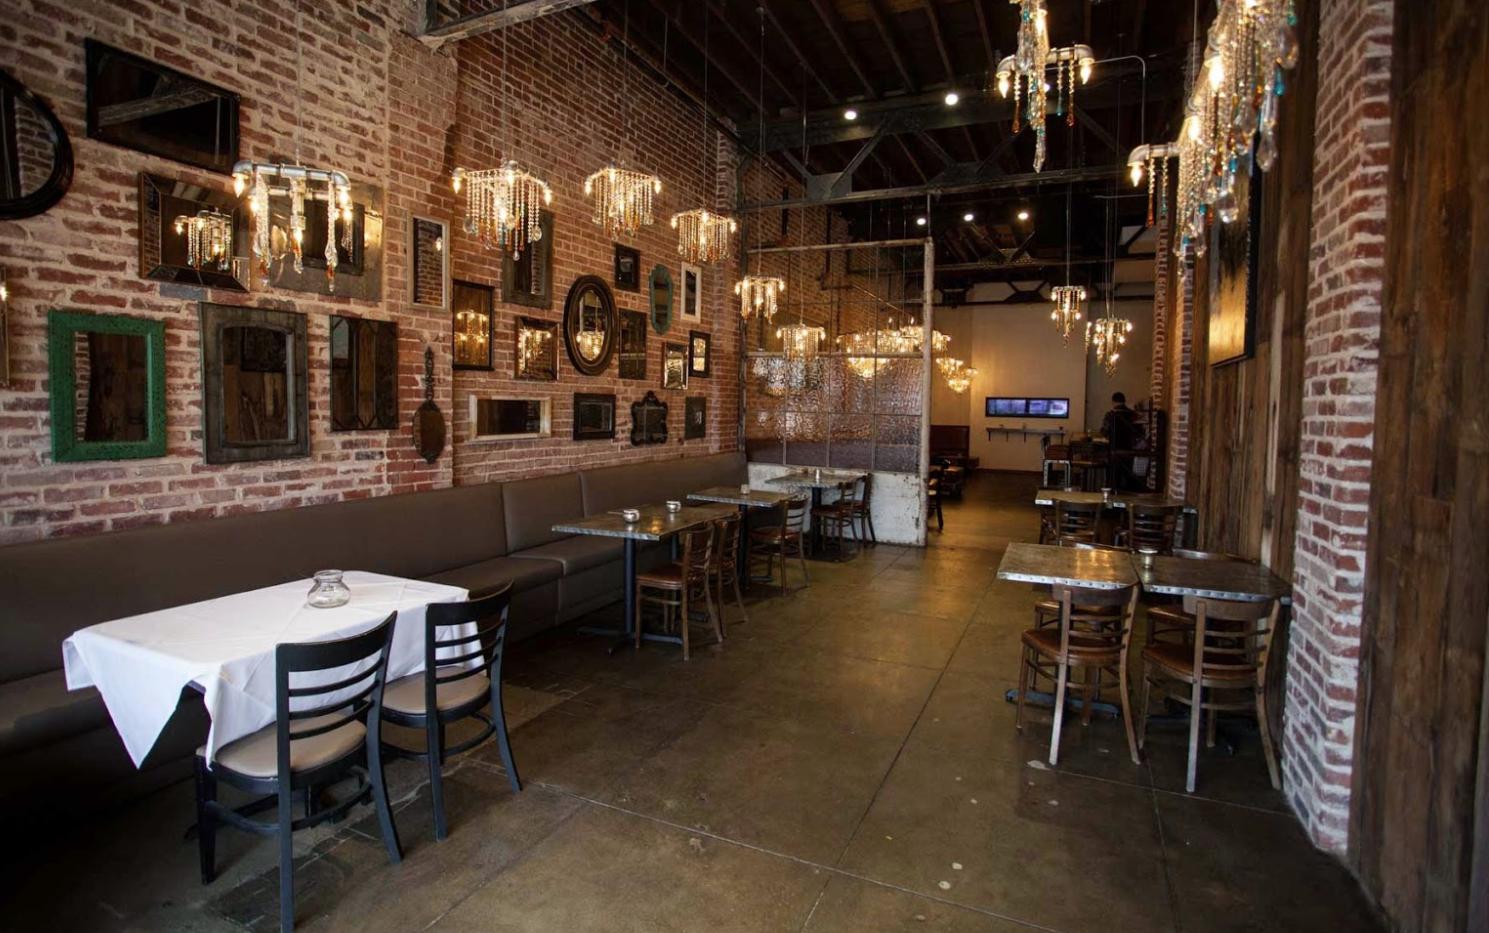 Bramble Breakfast & Bar - Downtown image 7